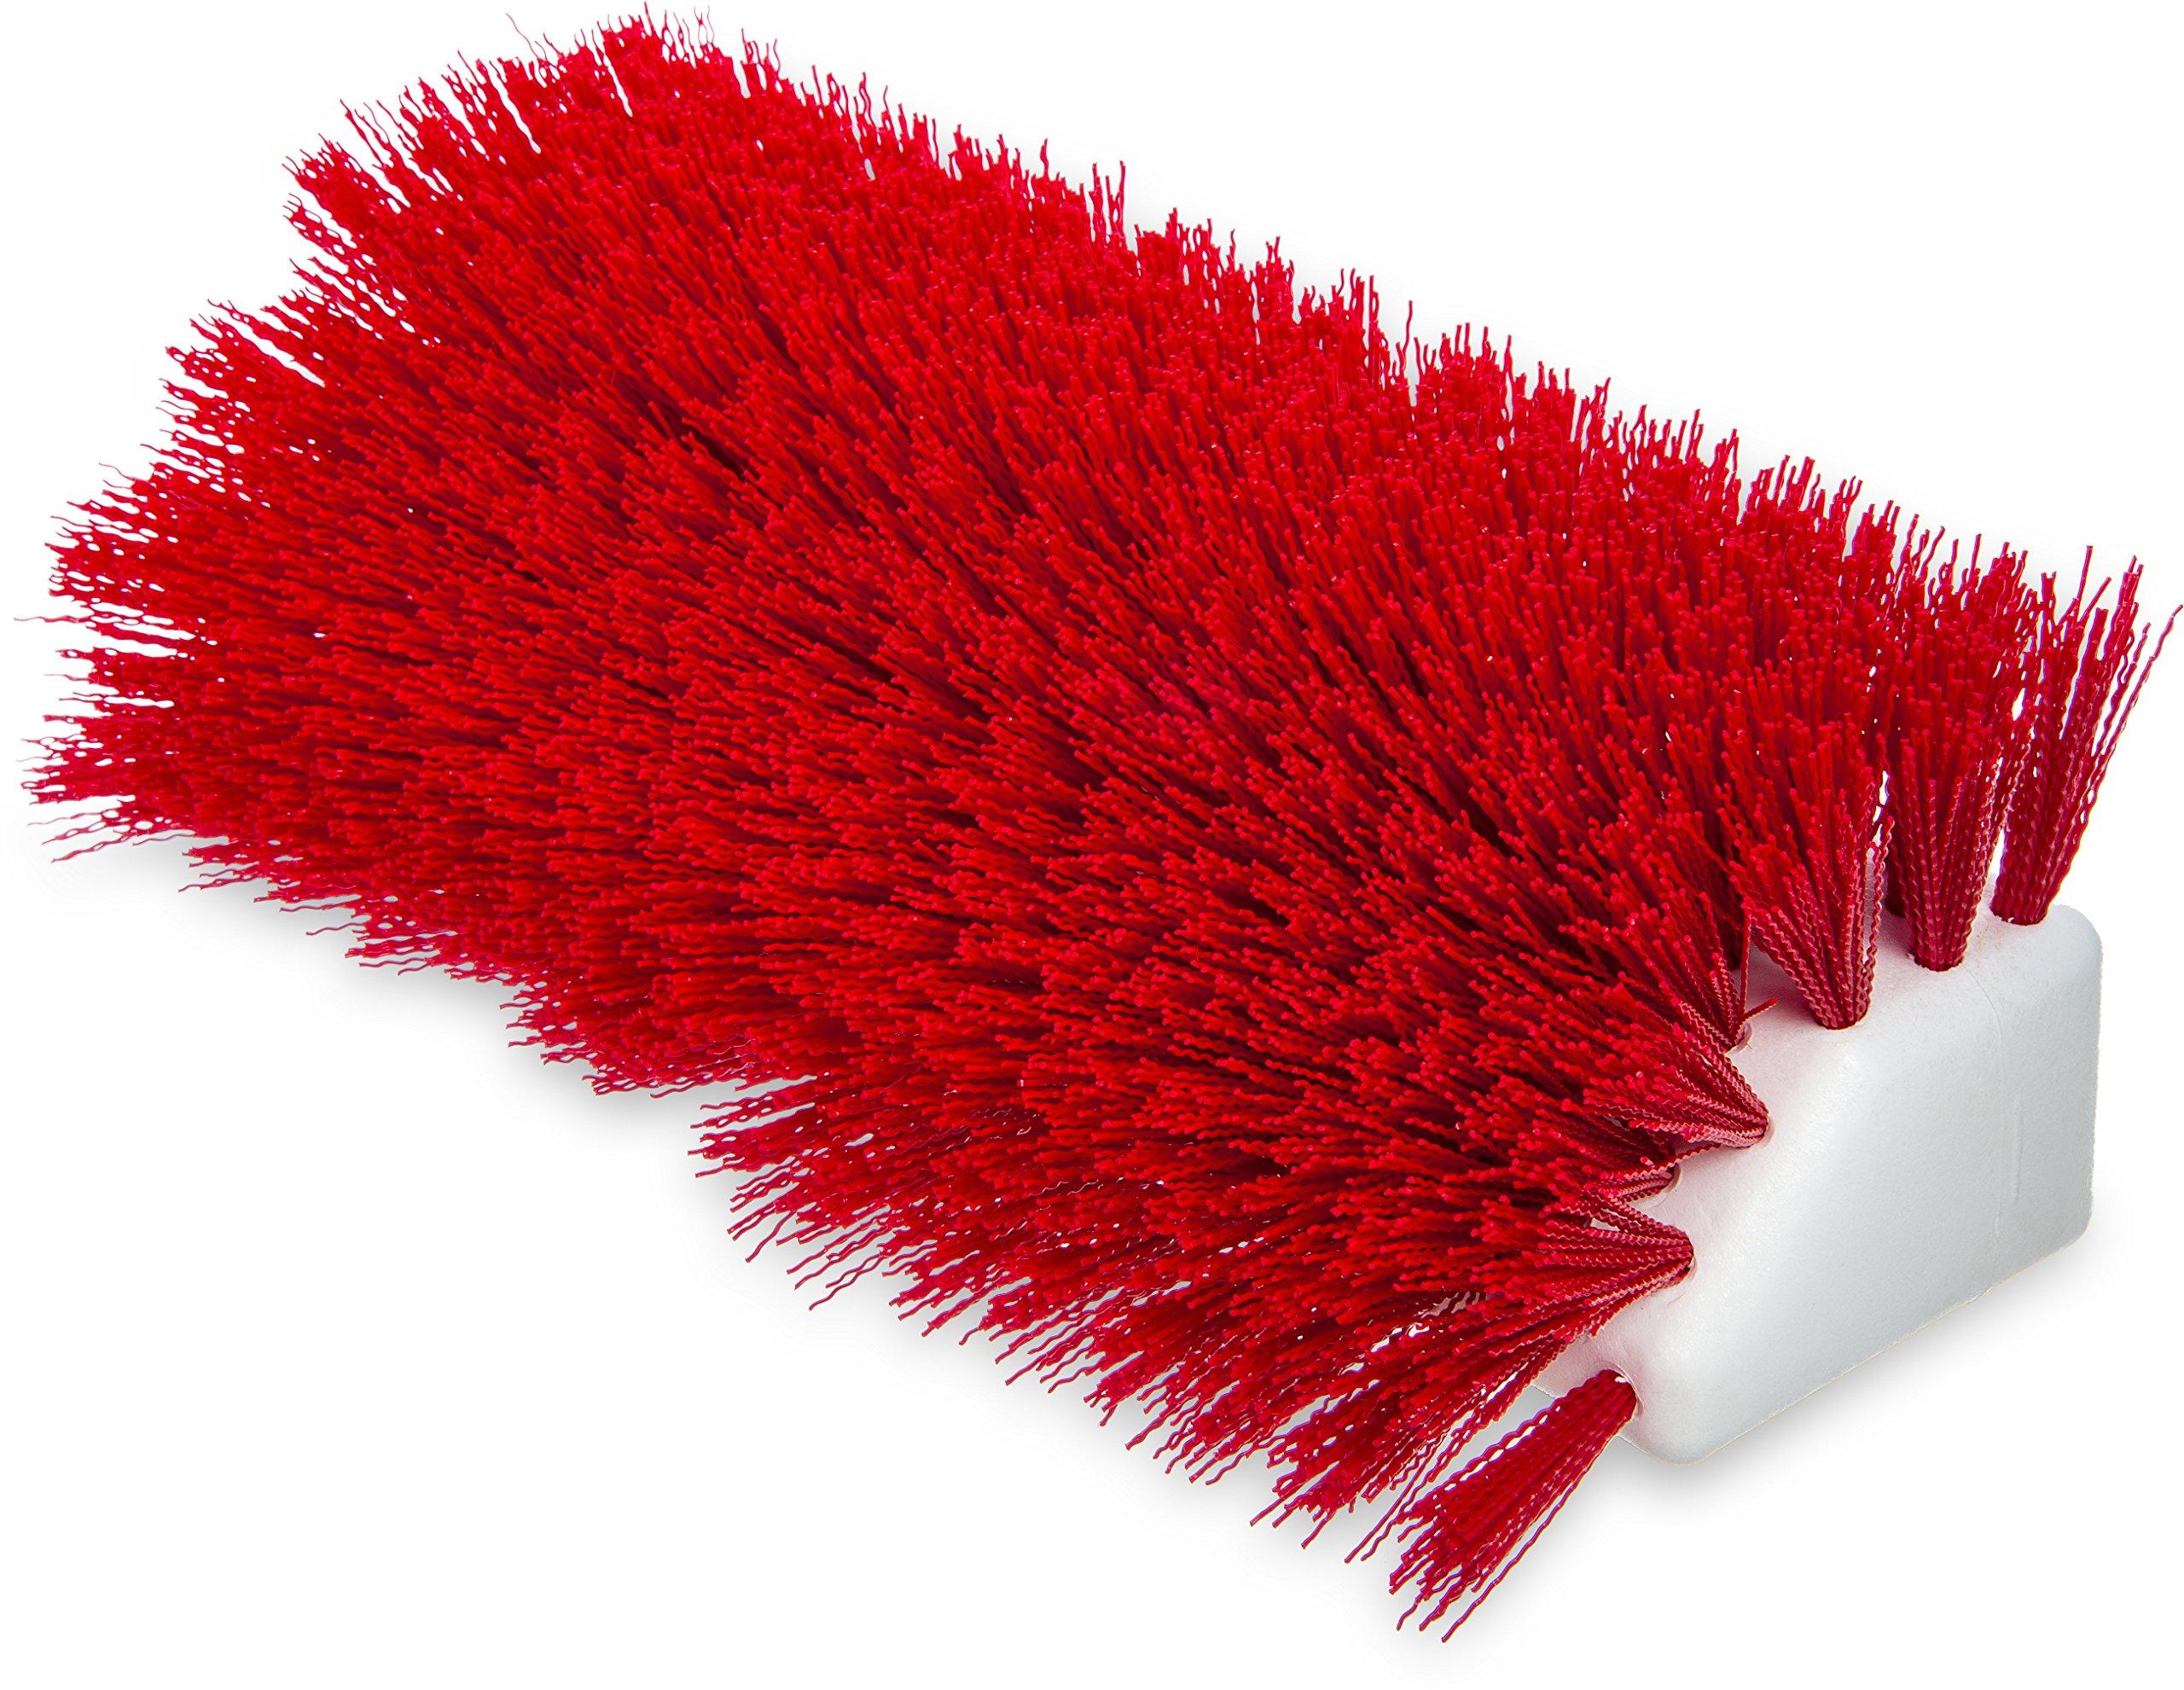 Carlisle 4042305 Hi-Lo Floor Scrub Brush, Red (Pack of 12)